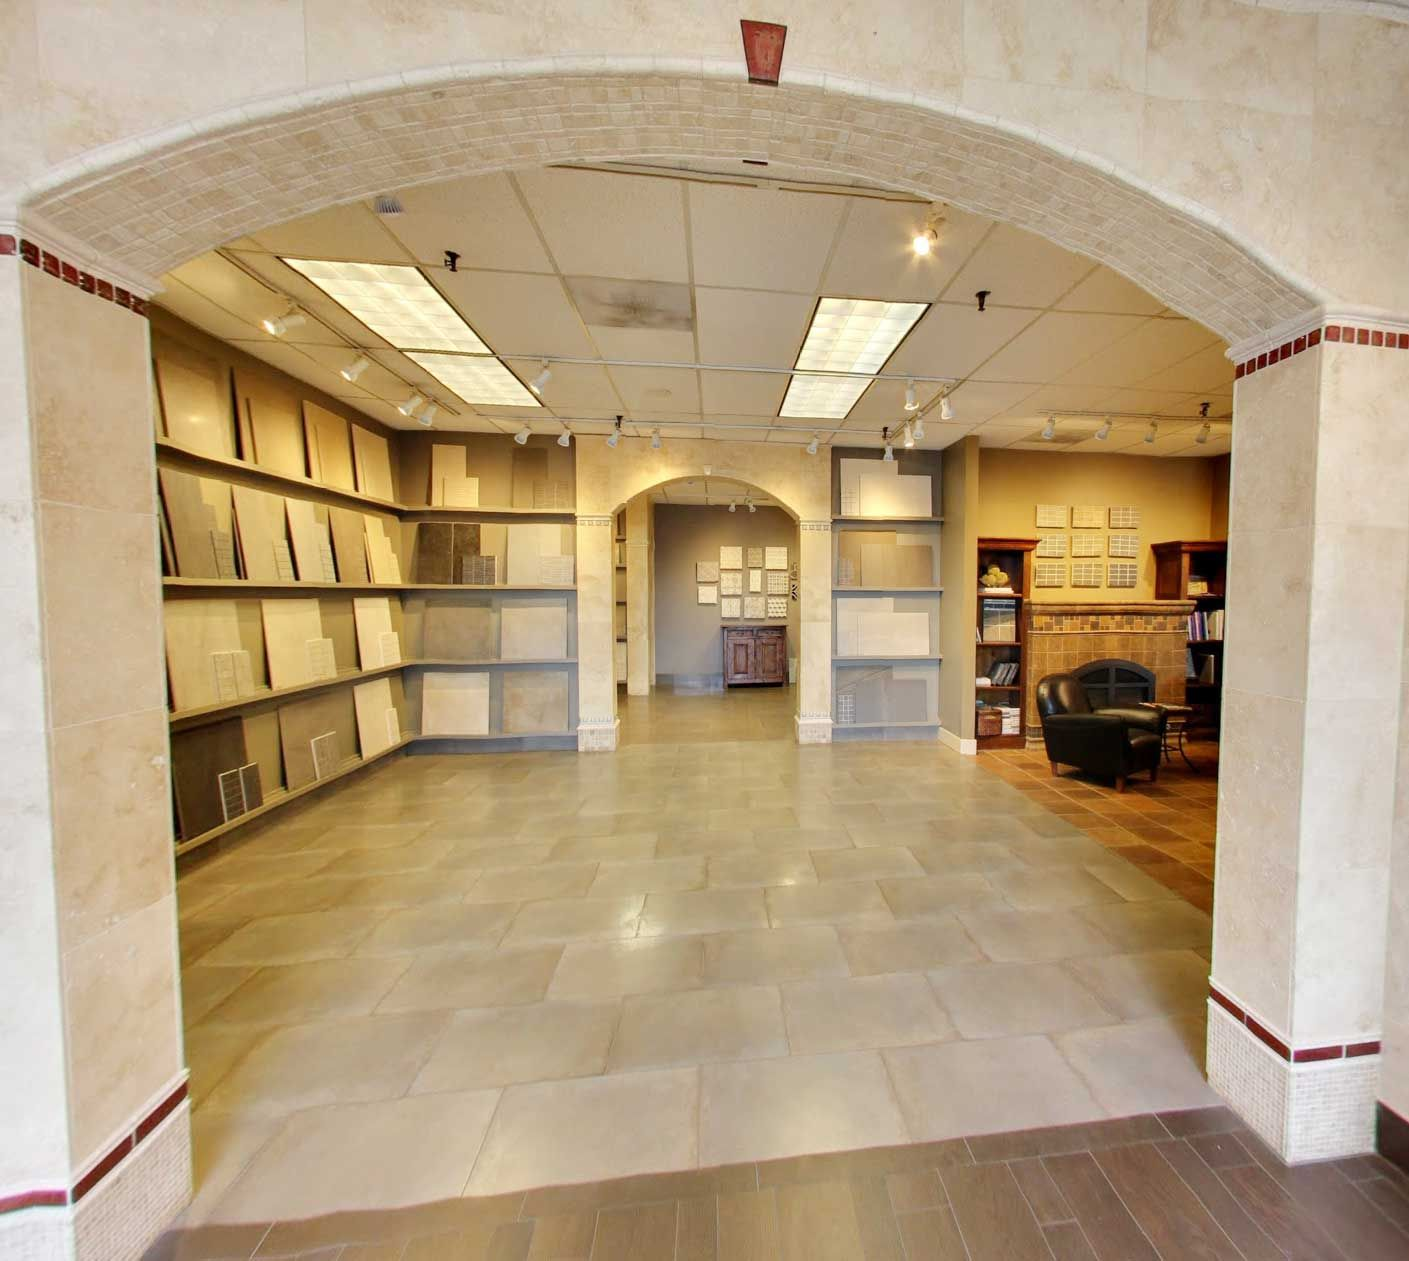 Julian Tile Showroom In Seattle, Washington. 6140, 6th Ave